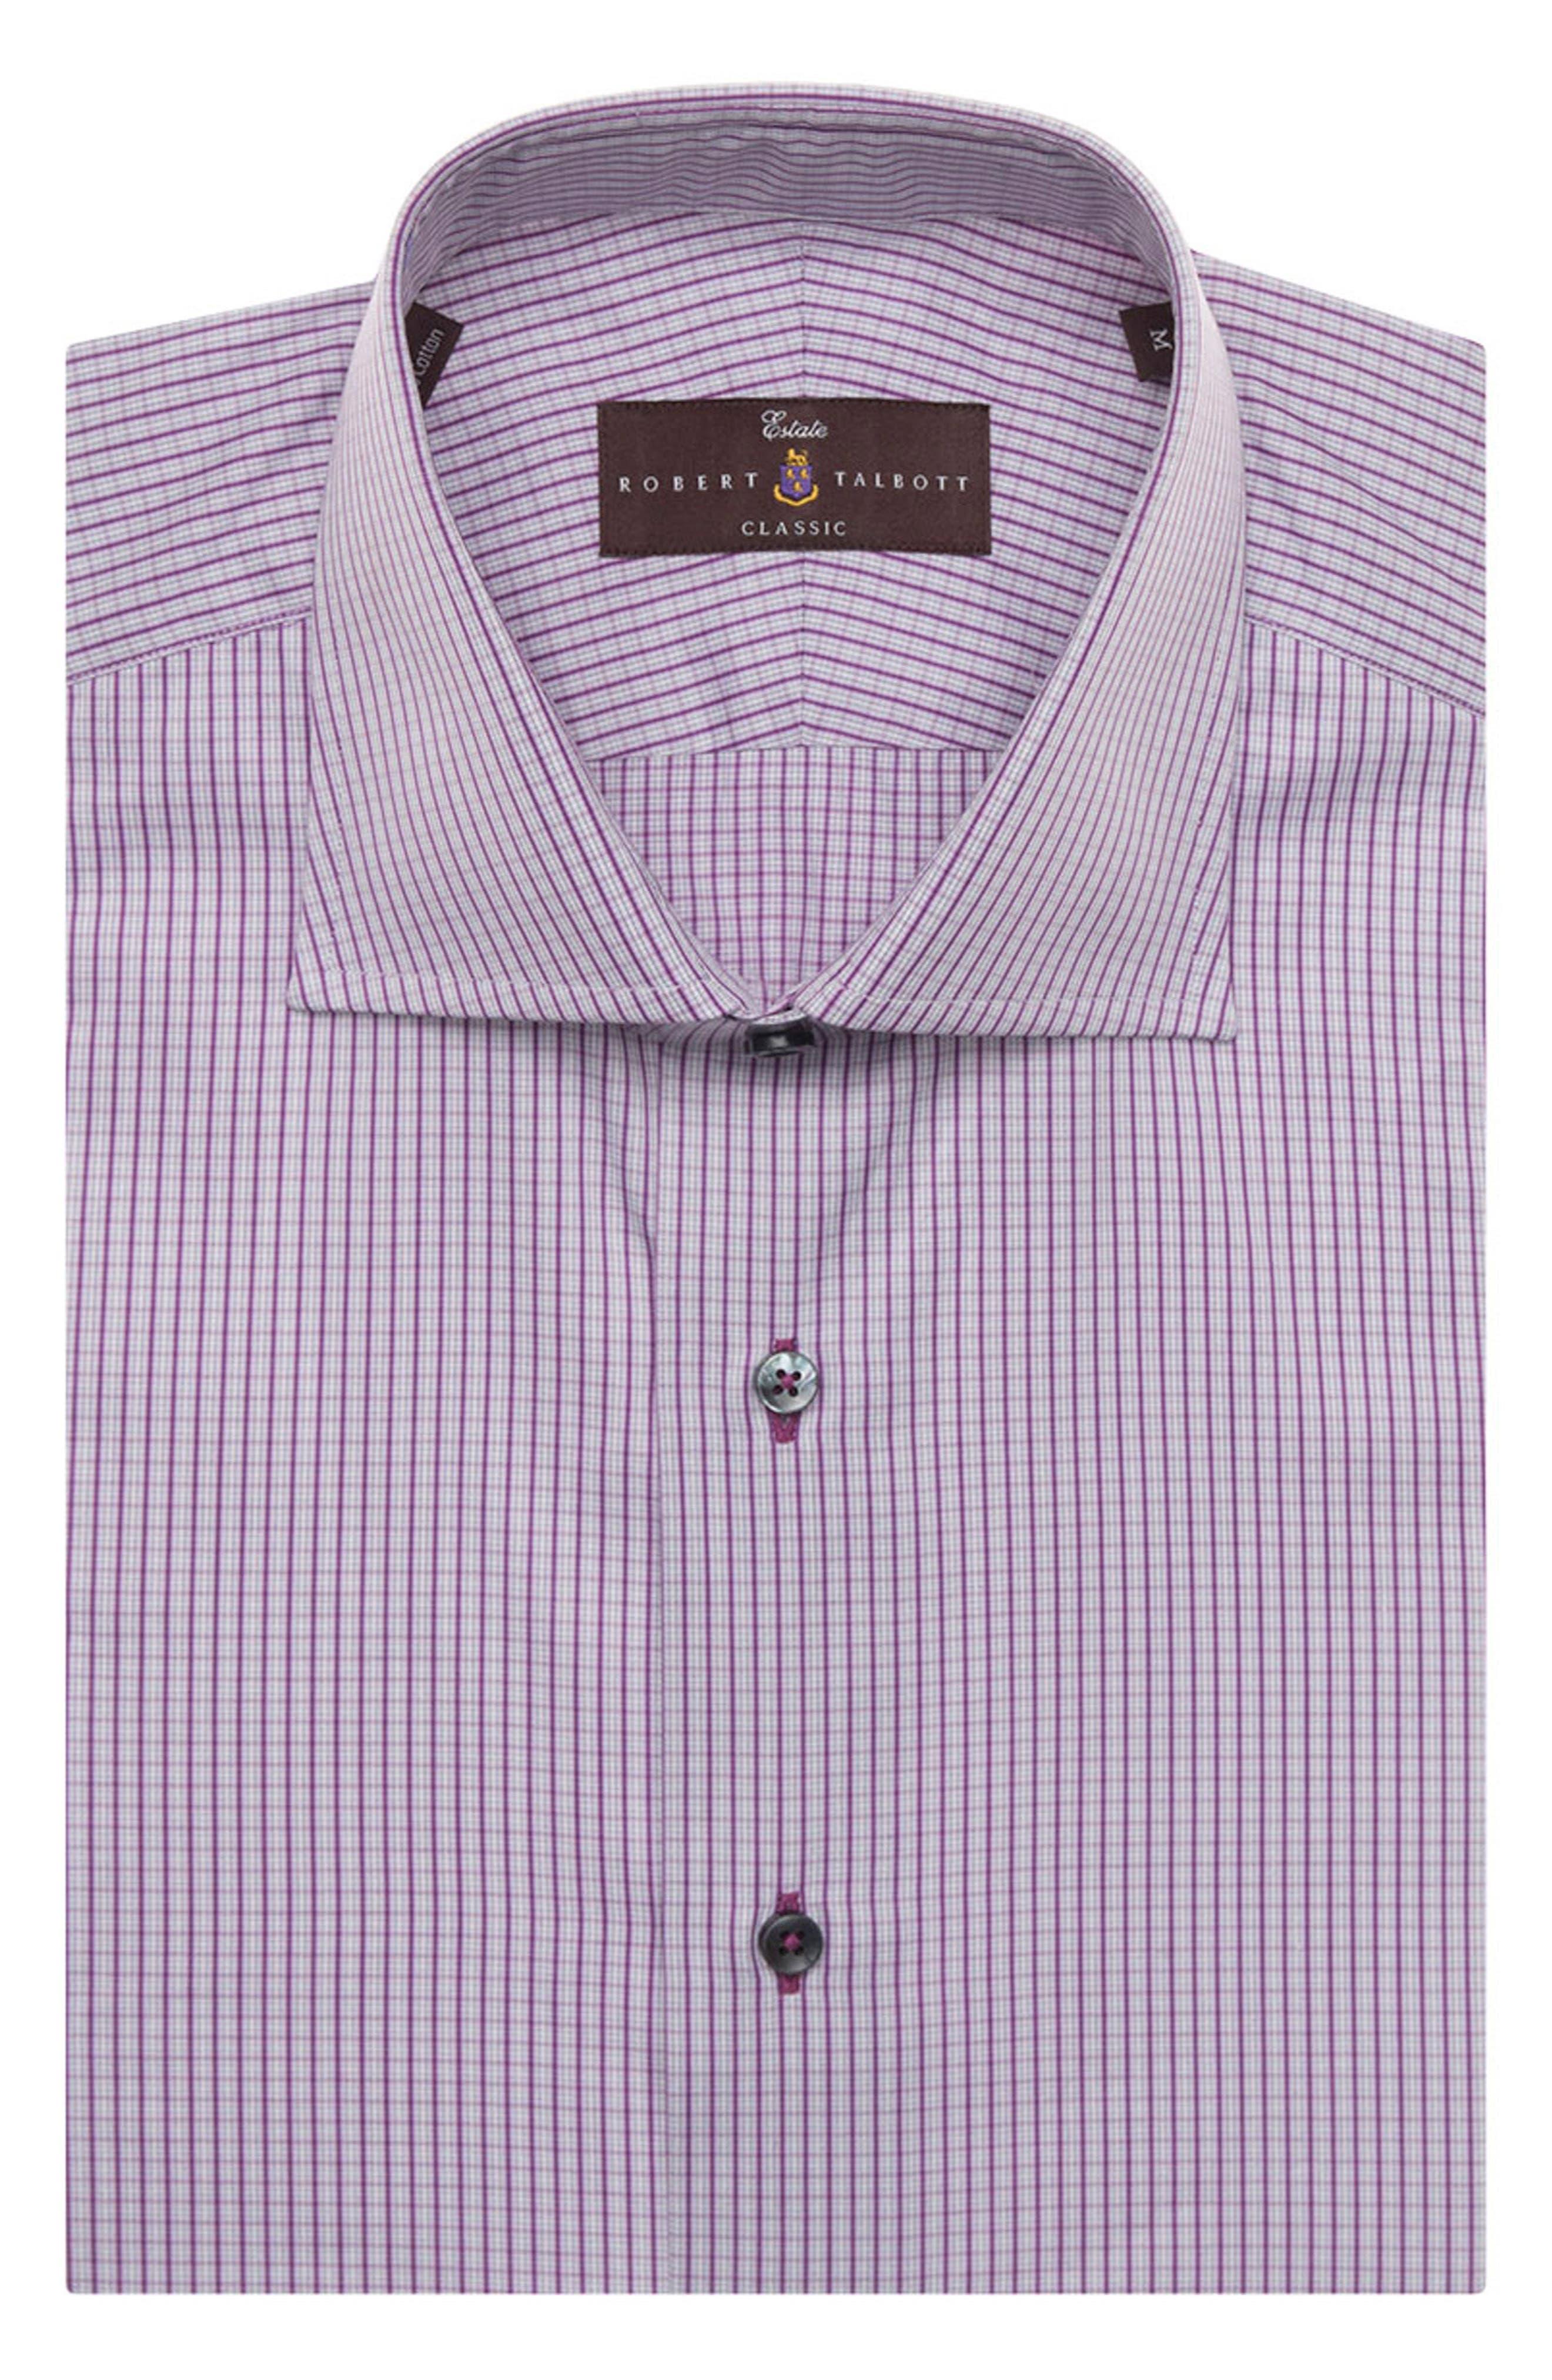 Tailored Fit Check Dress Shirt,                             Main thumbnail 1, color,                             ASTER